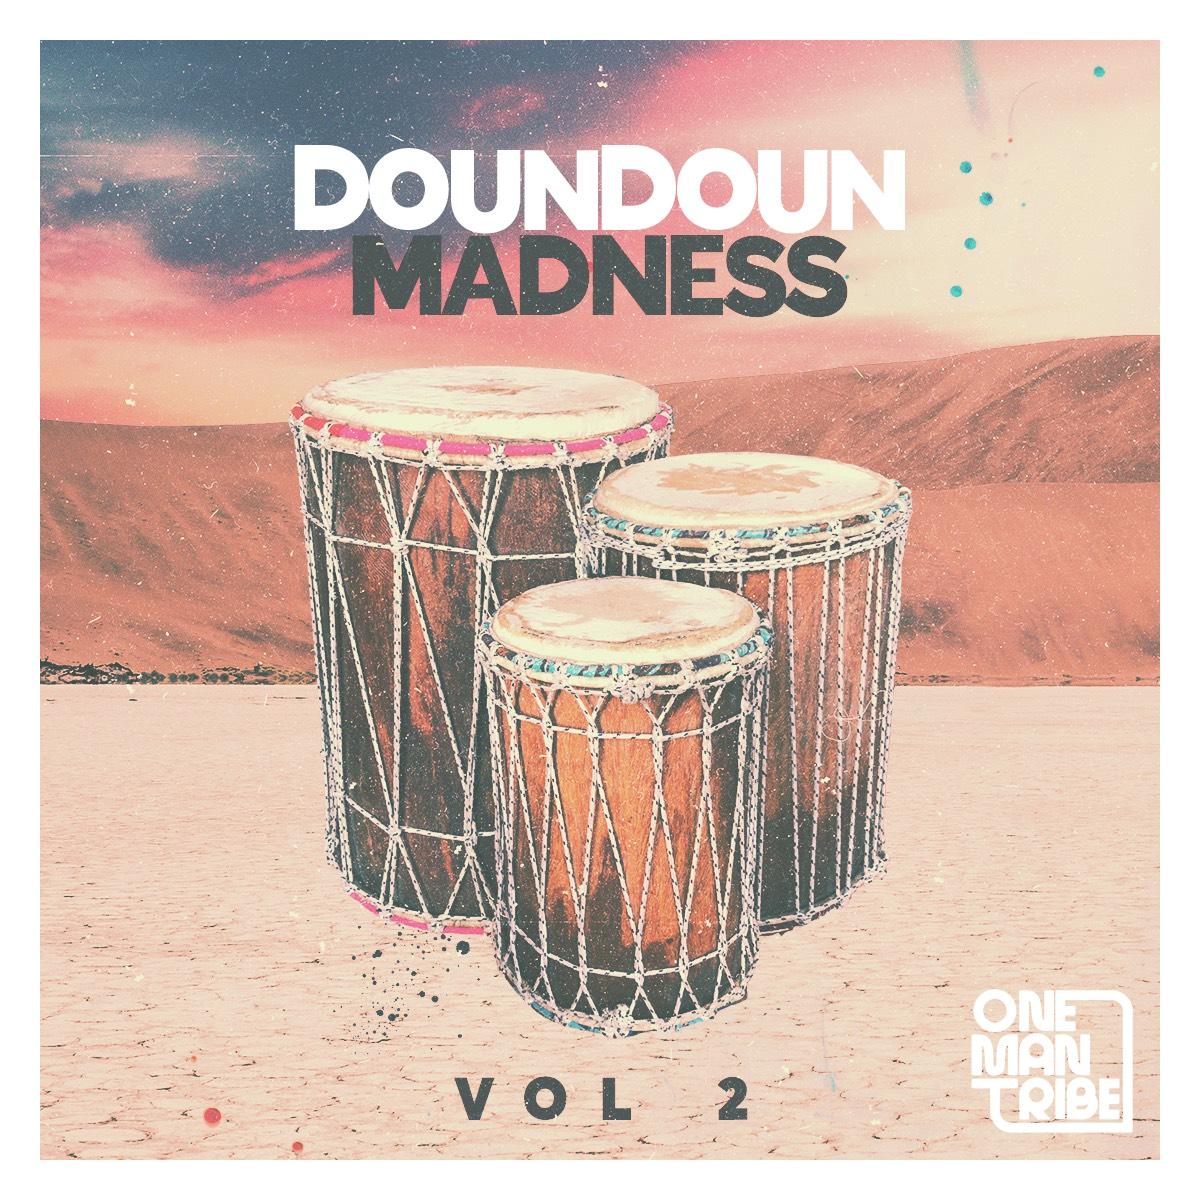 Doundoun Madness Vol. 2